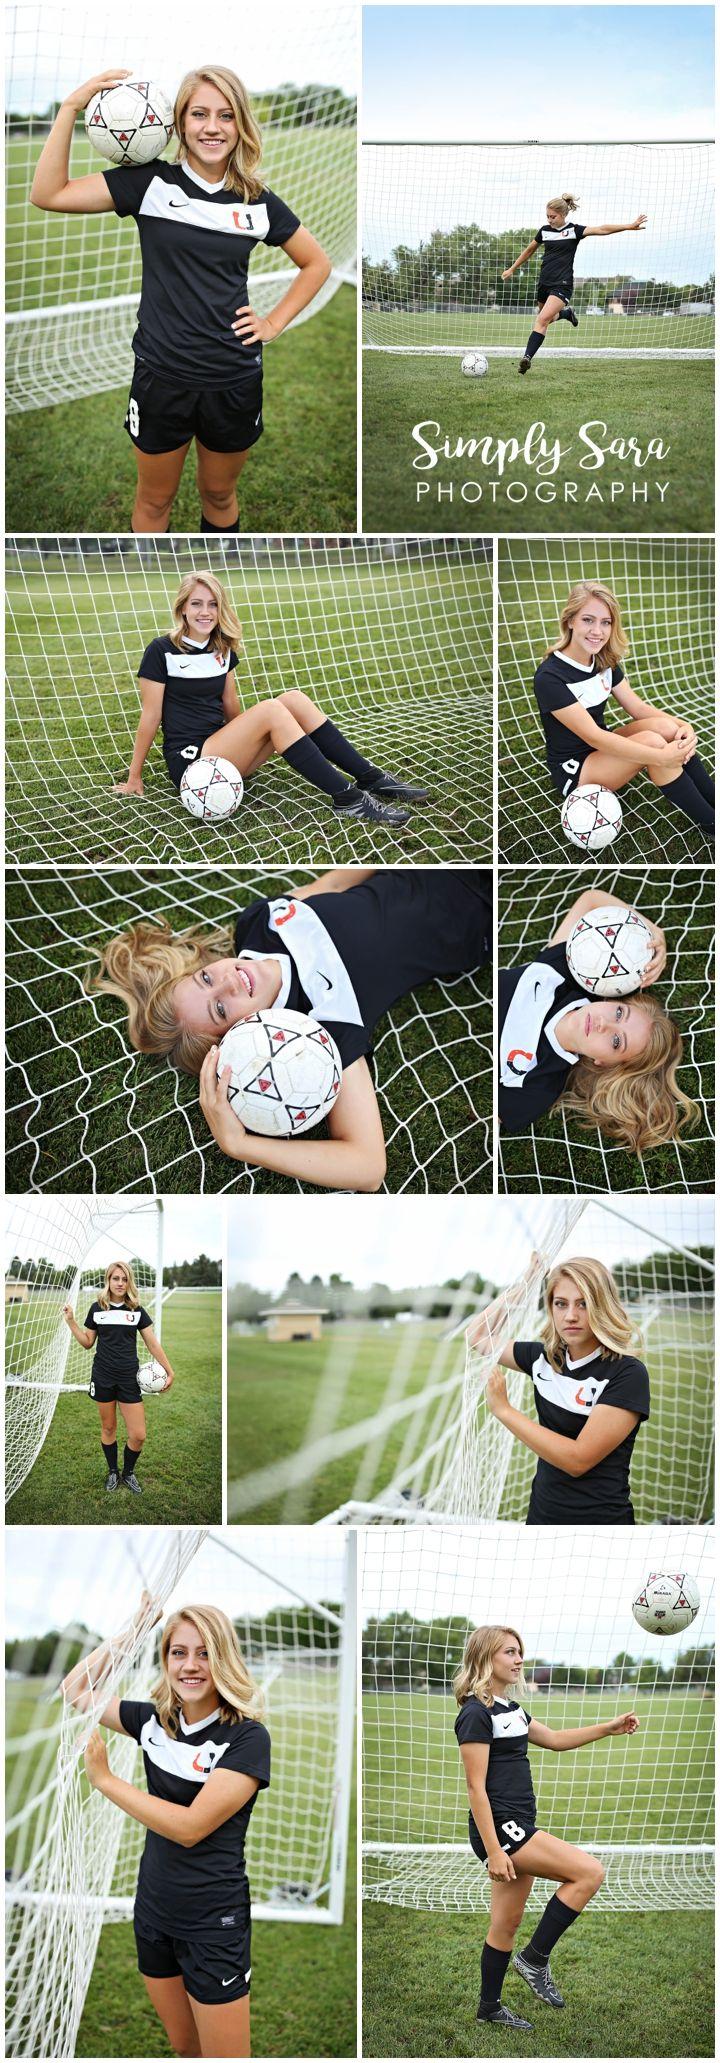 Sports Photography School: Senior Portrait Photos & Poses For Girls